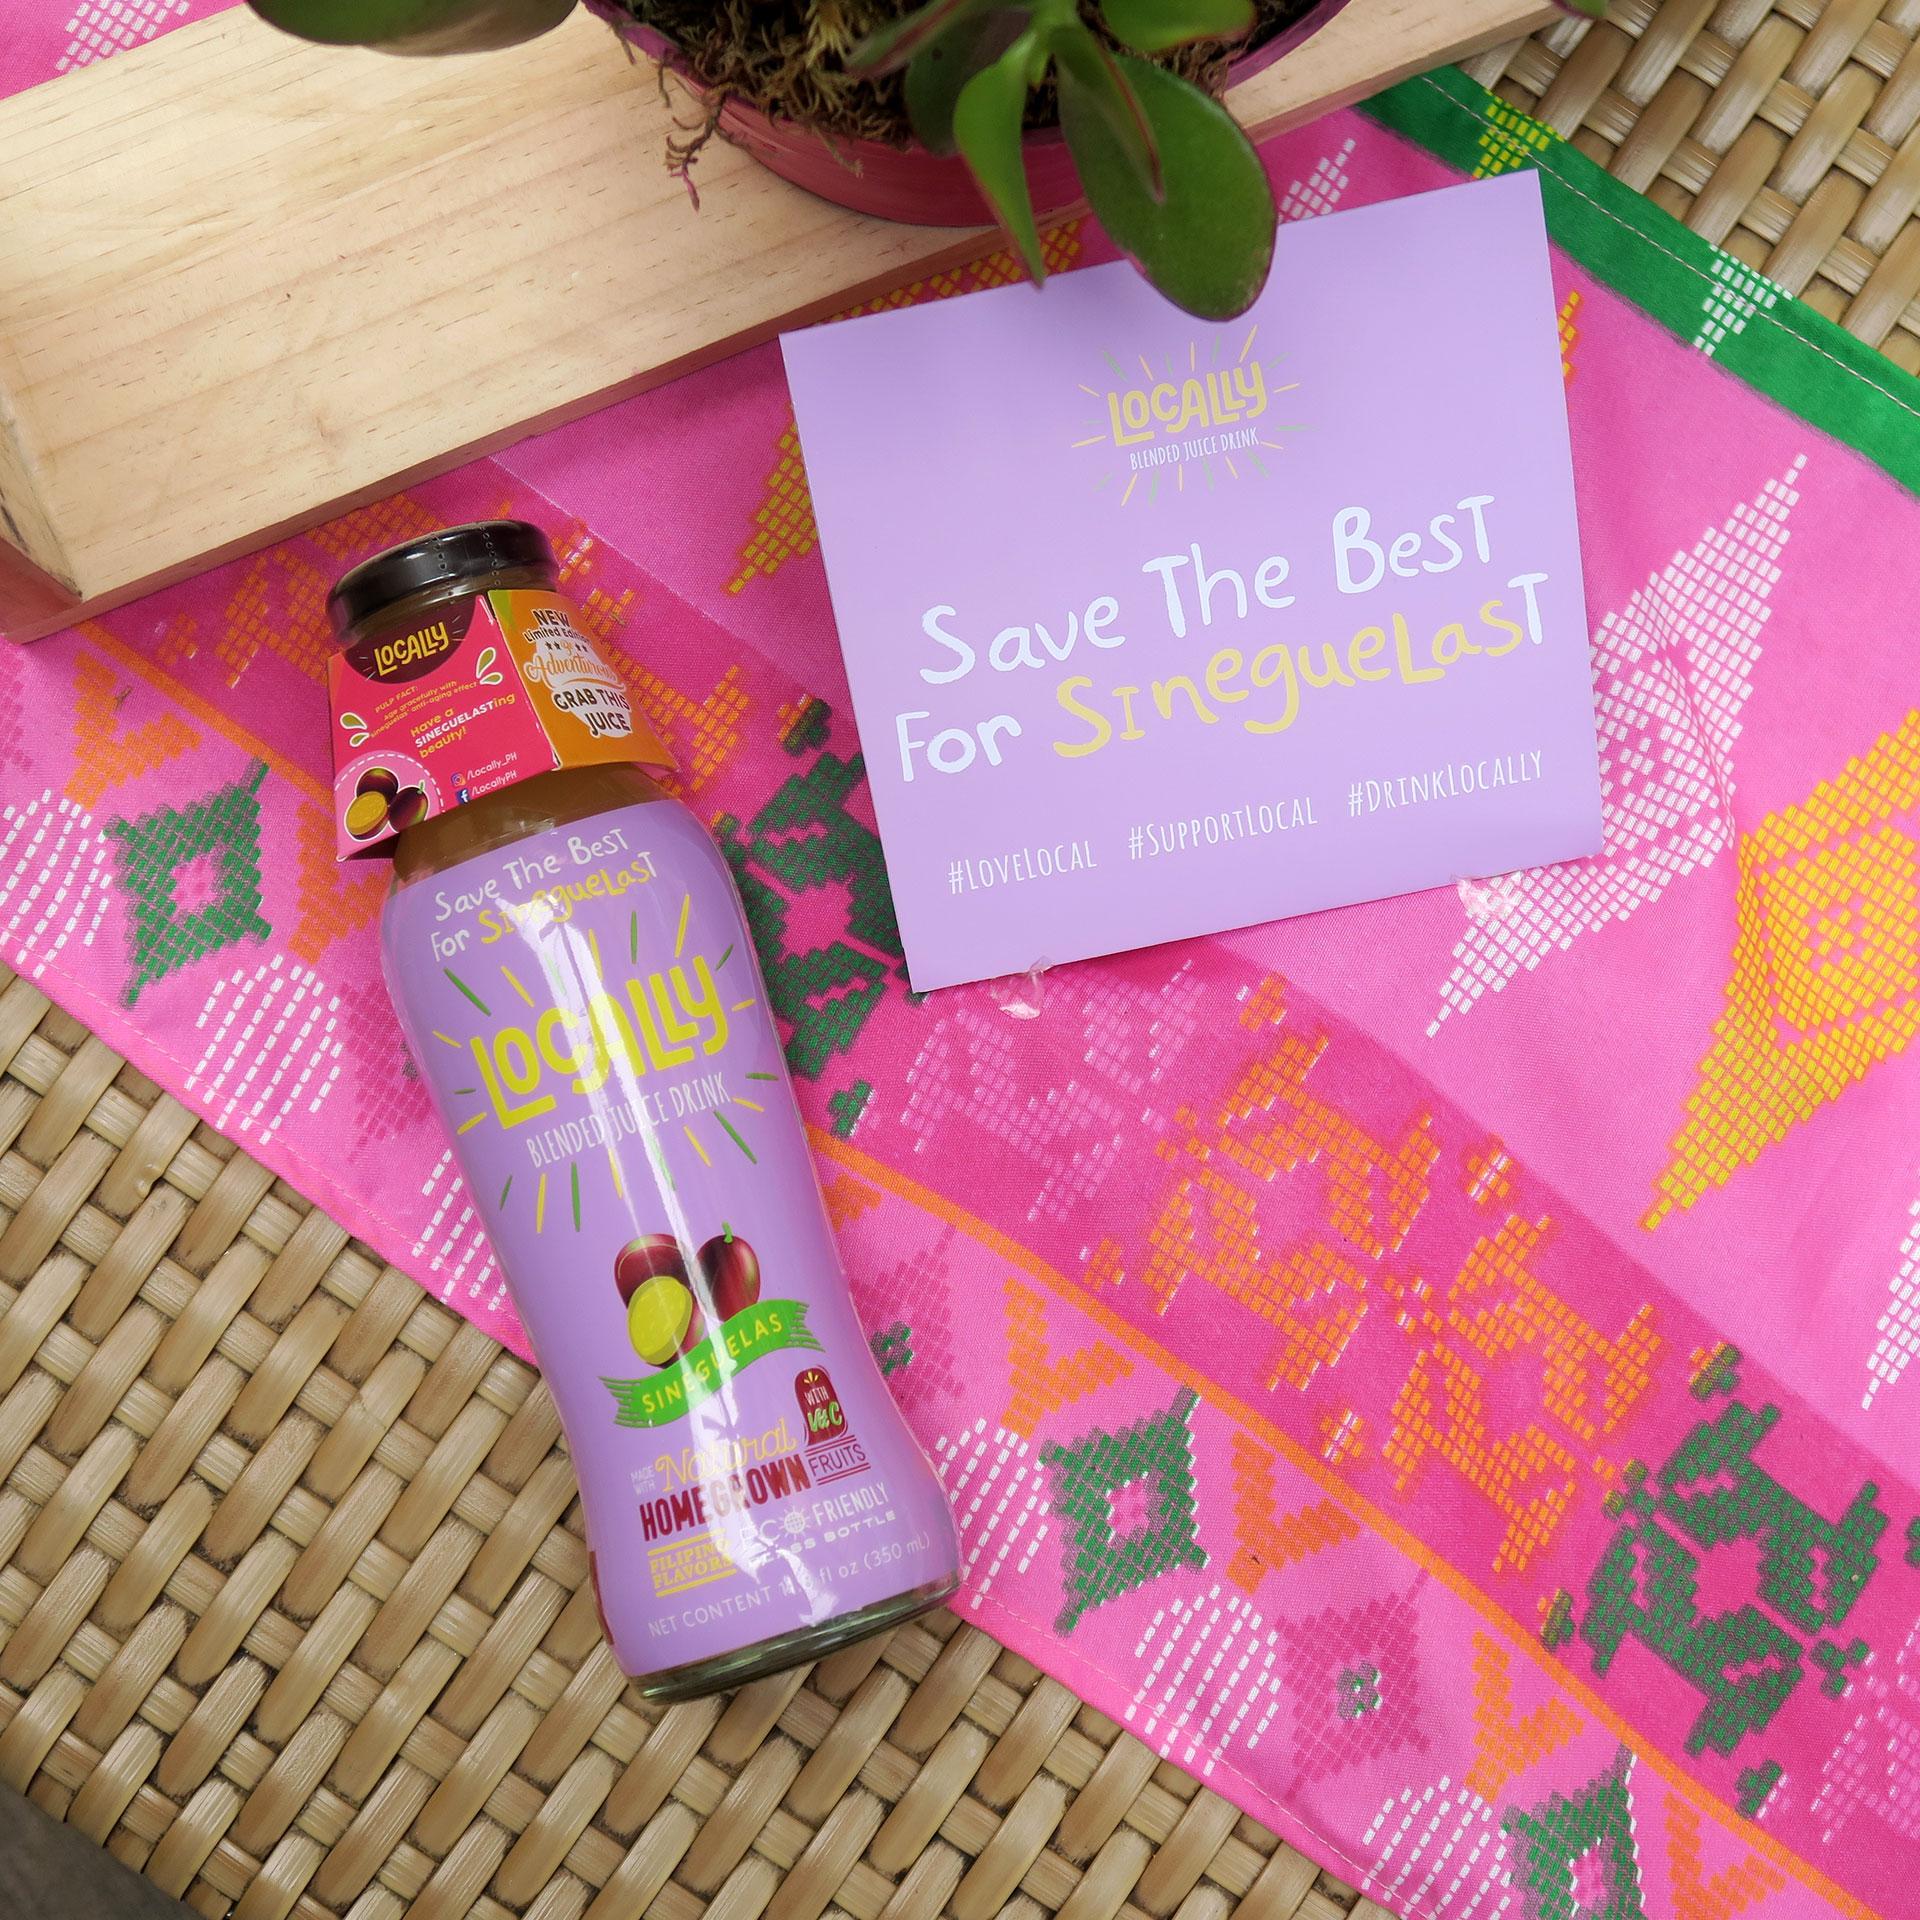 10 Locally Blended Juice Drink Review Photos - Gen-zel She Sings Beauty